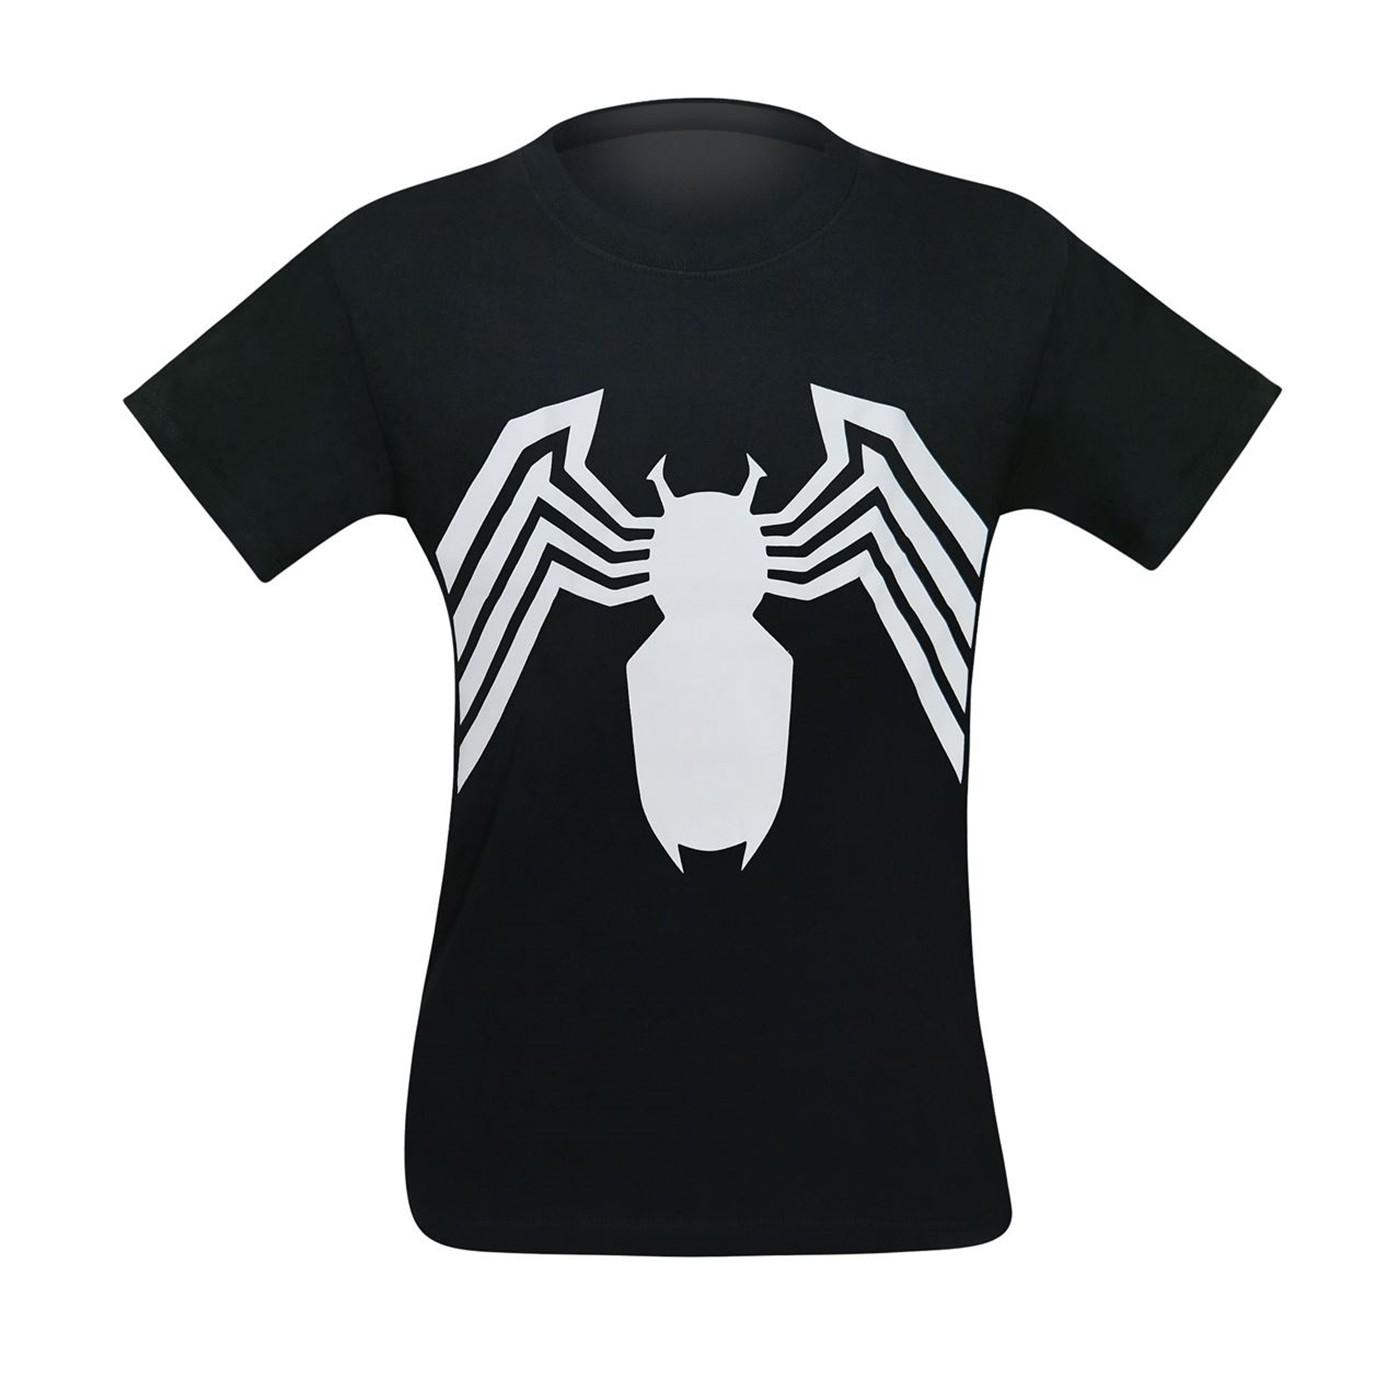 Spider-Man Venom Short Sleeve T-Shirt